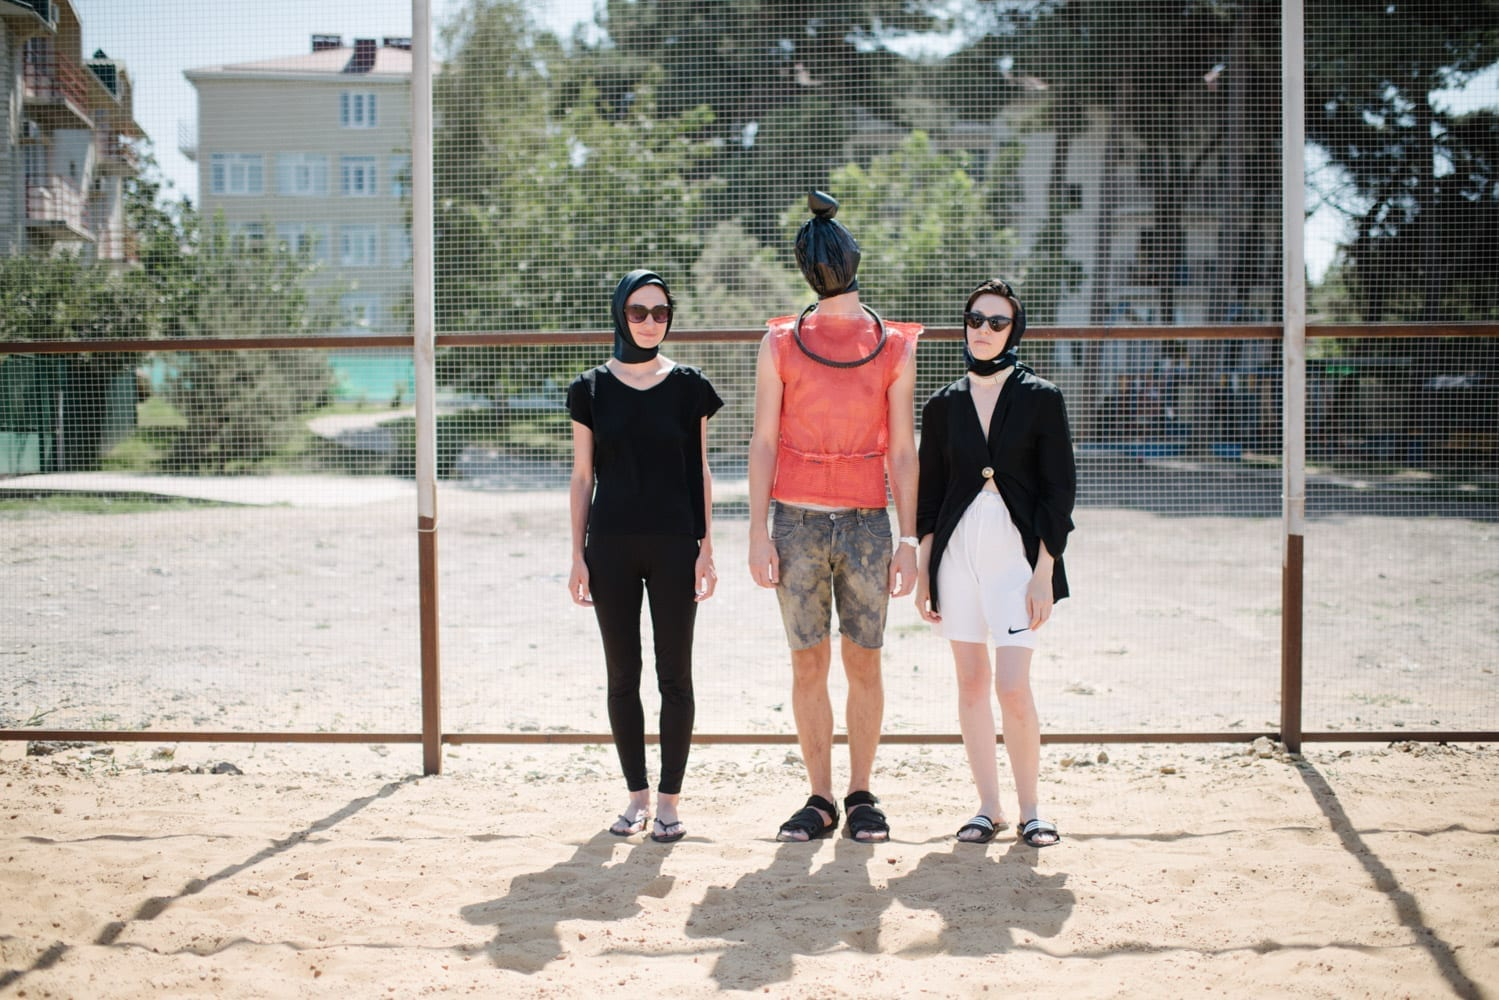 Анастасия Кизилова Spring Summer 2018 DIY Show.